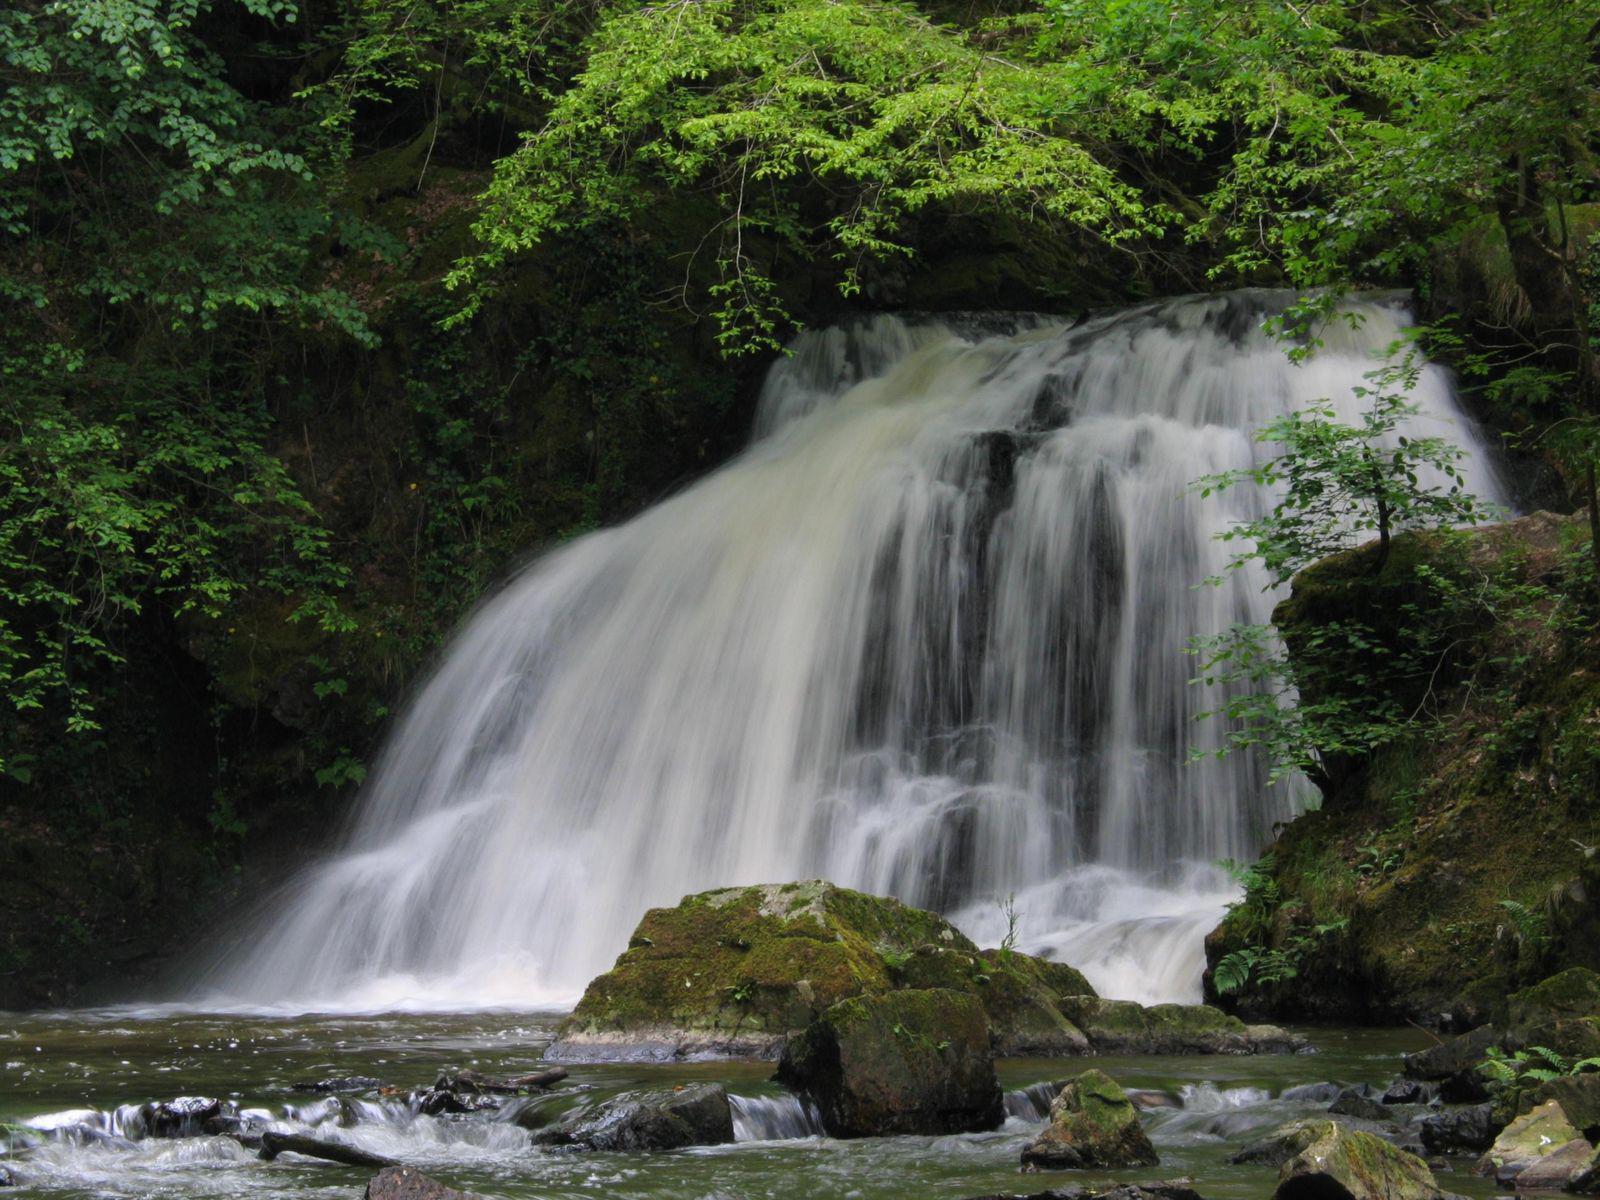 Cascades de Murel_Albussac